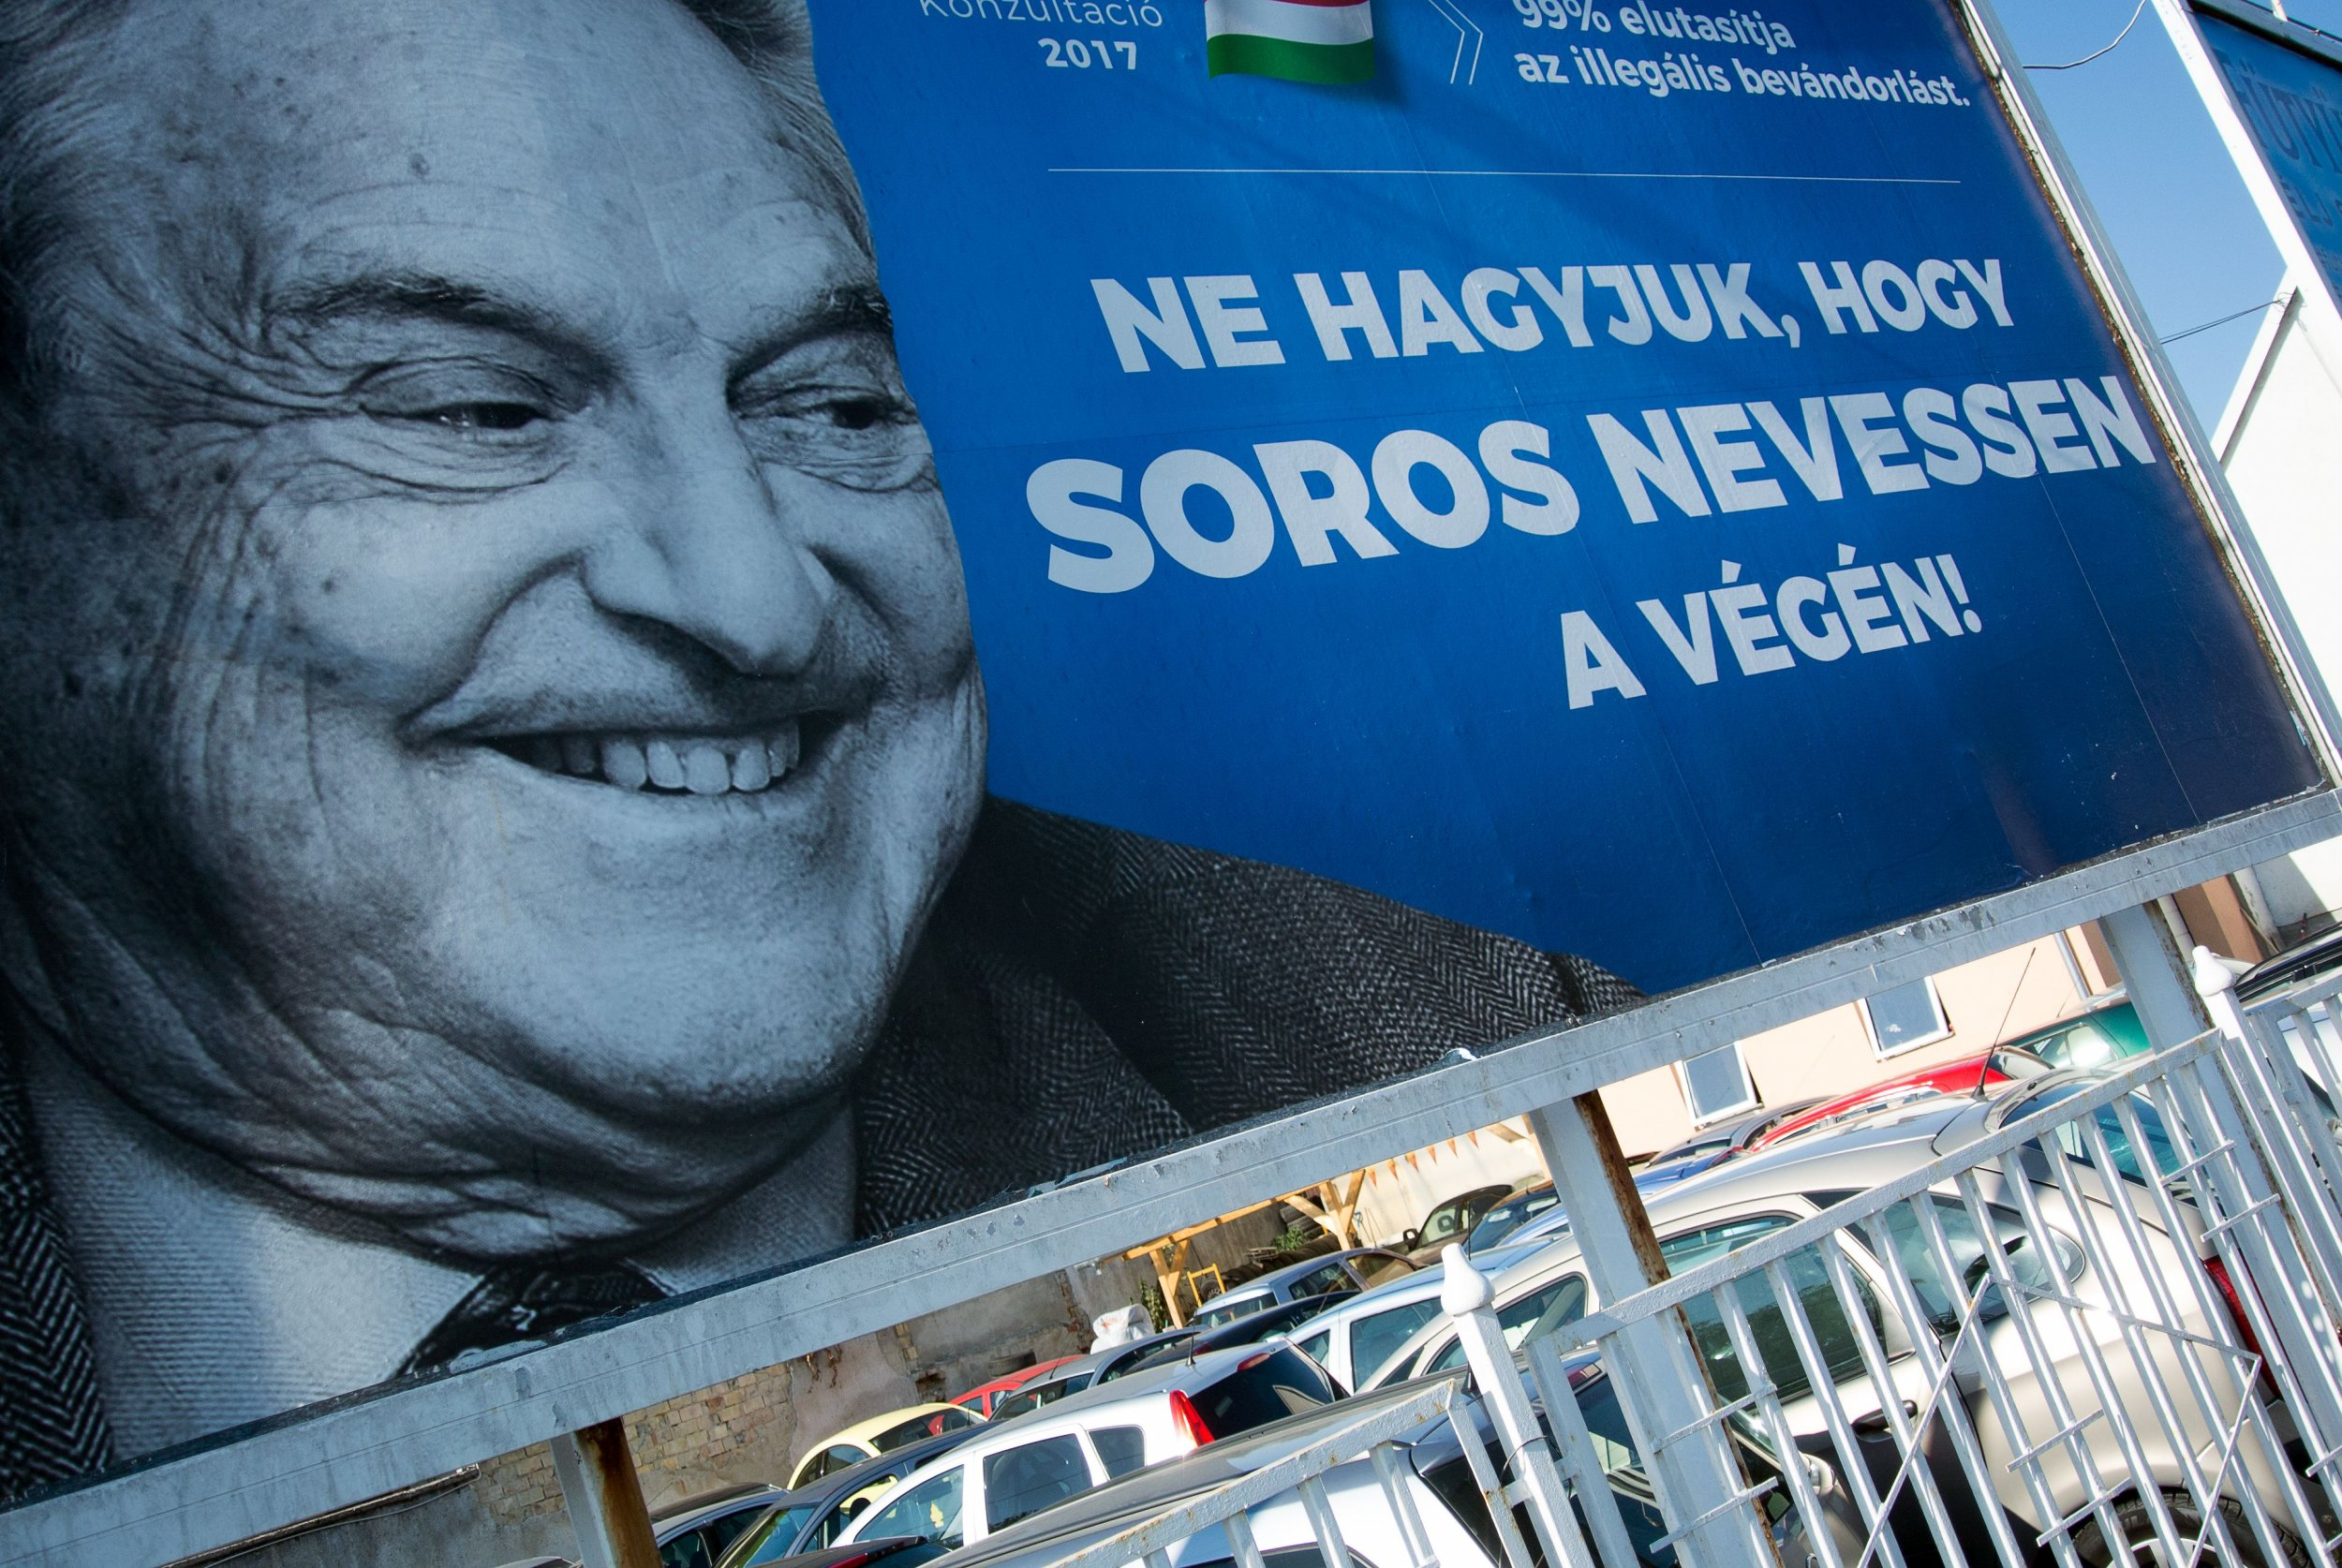 Hungary's George Soros posters